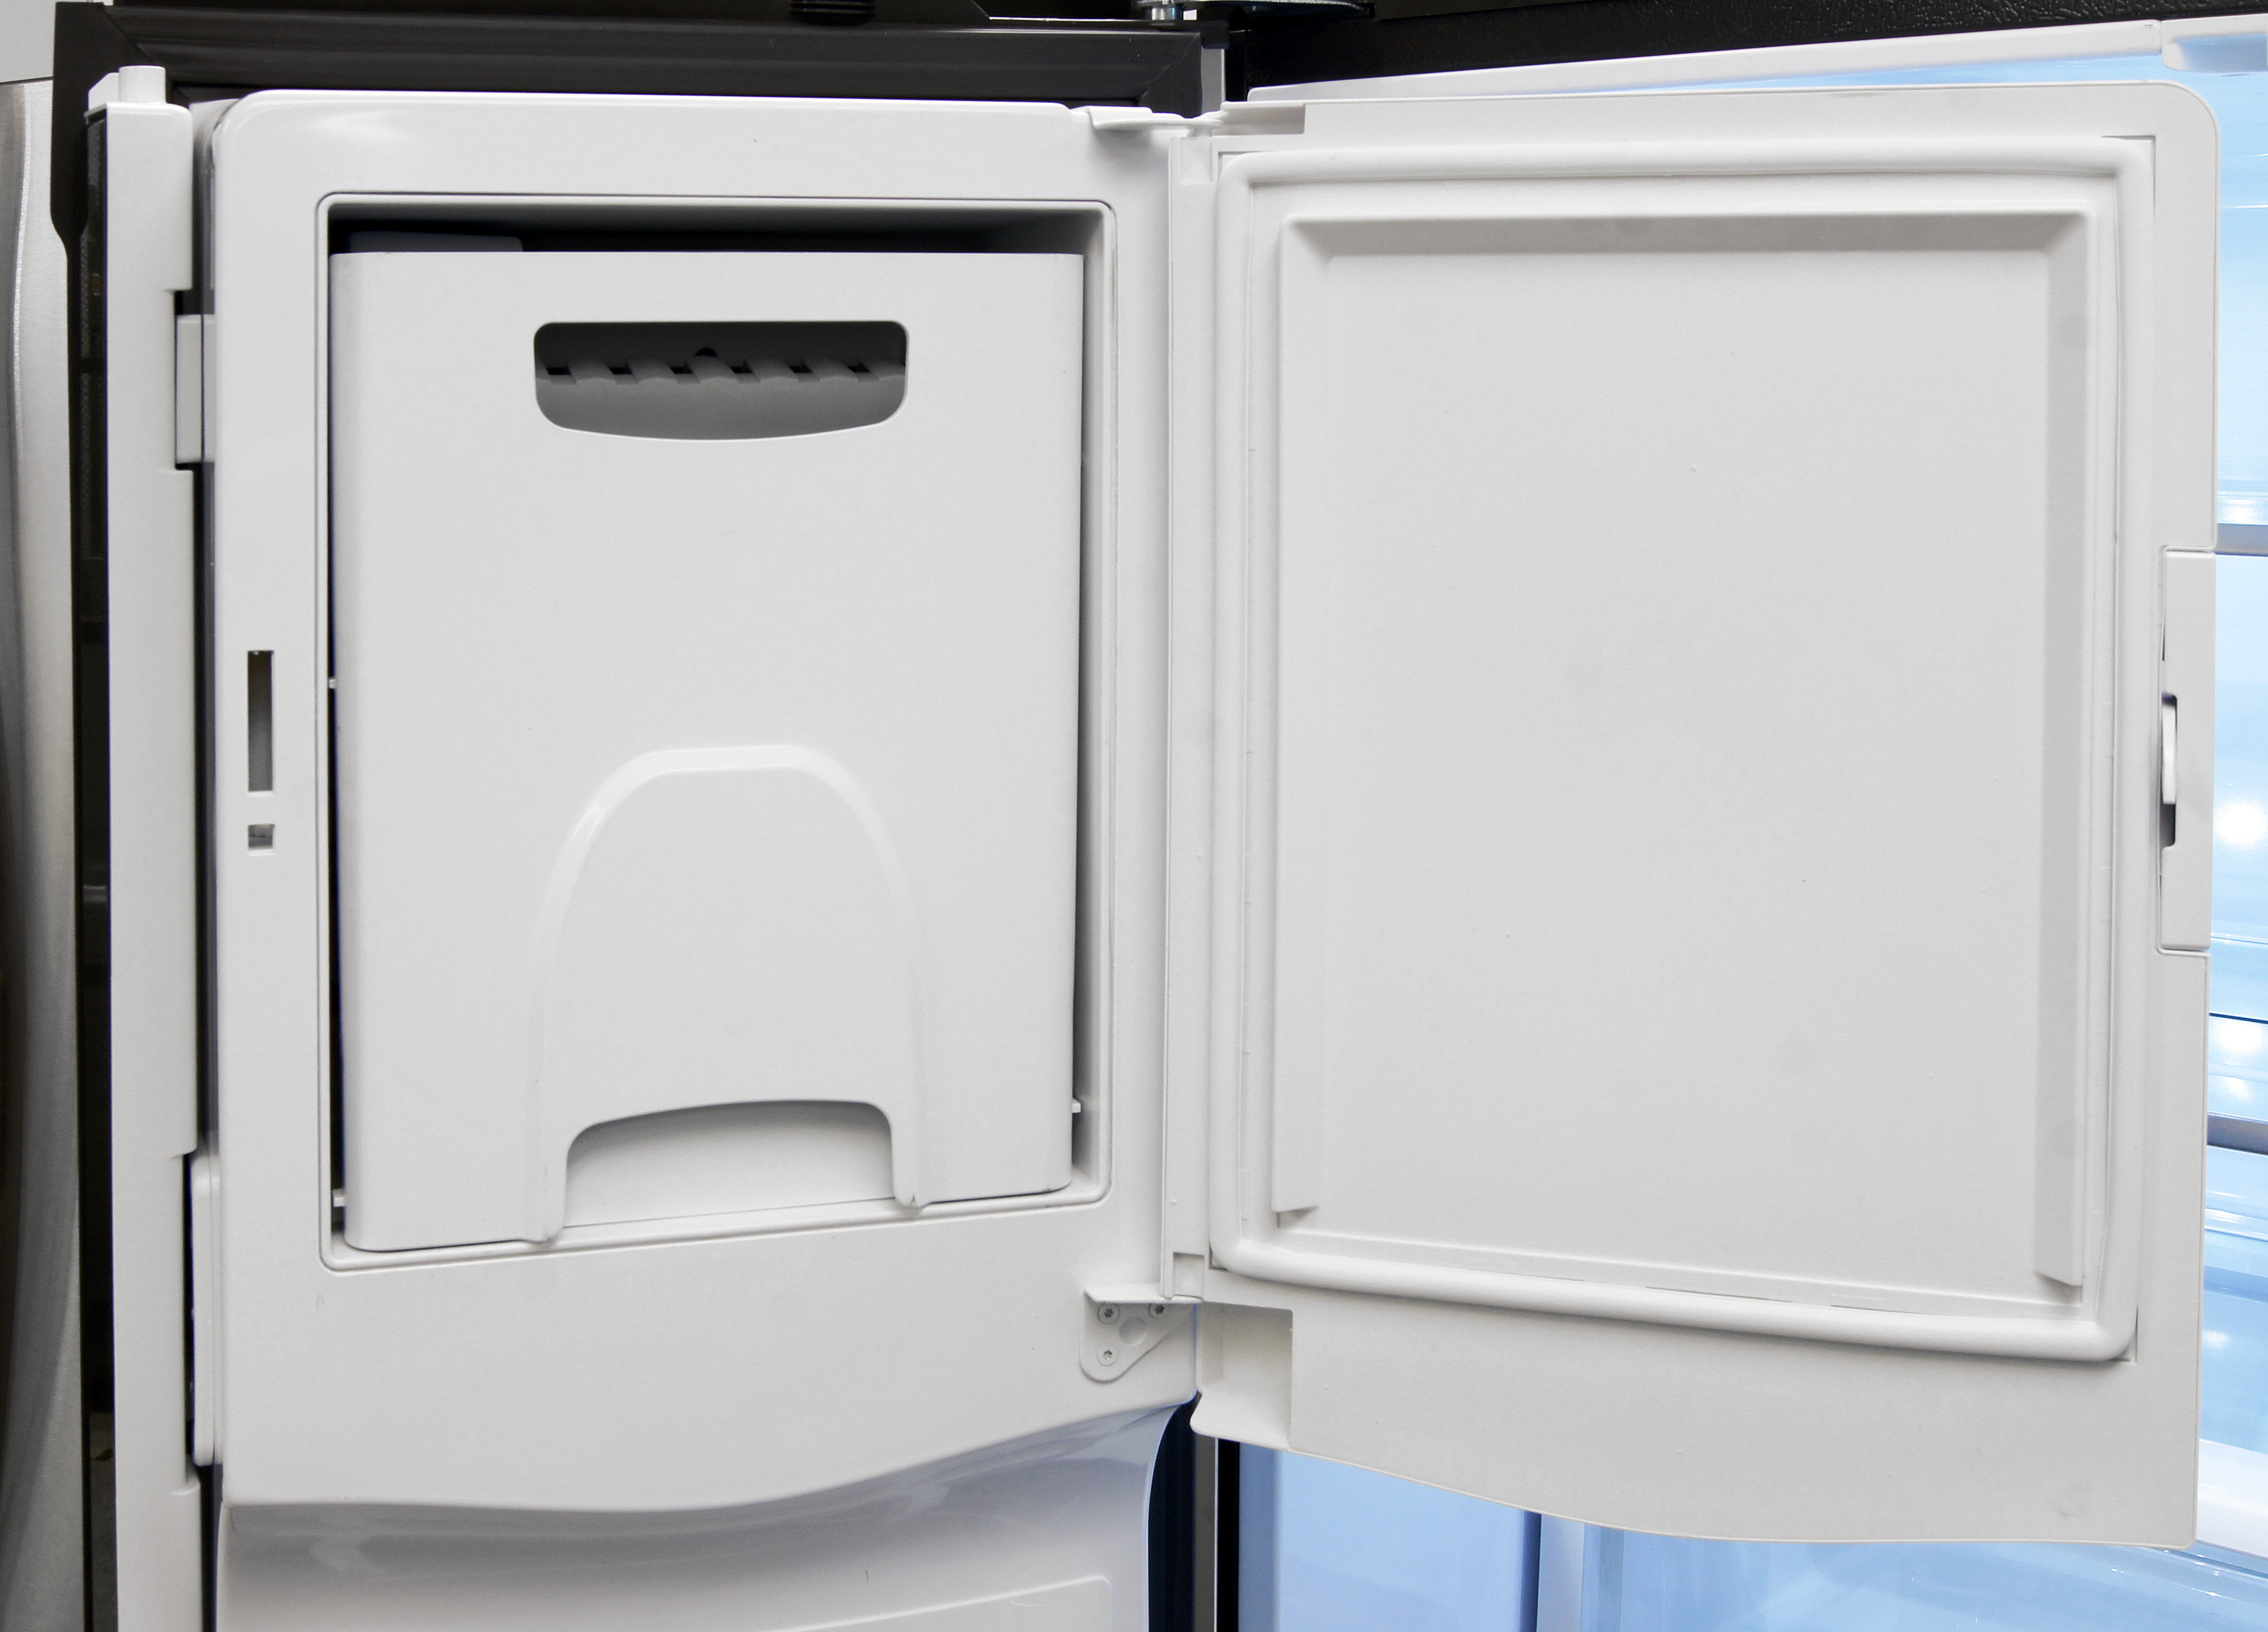 Cleaning Filter Ge Profile Dishwasher